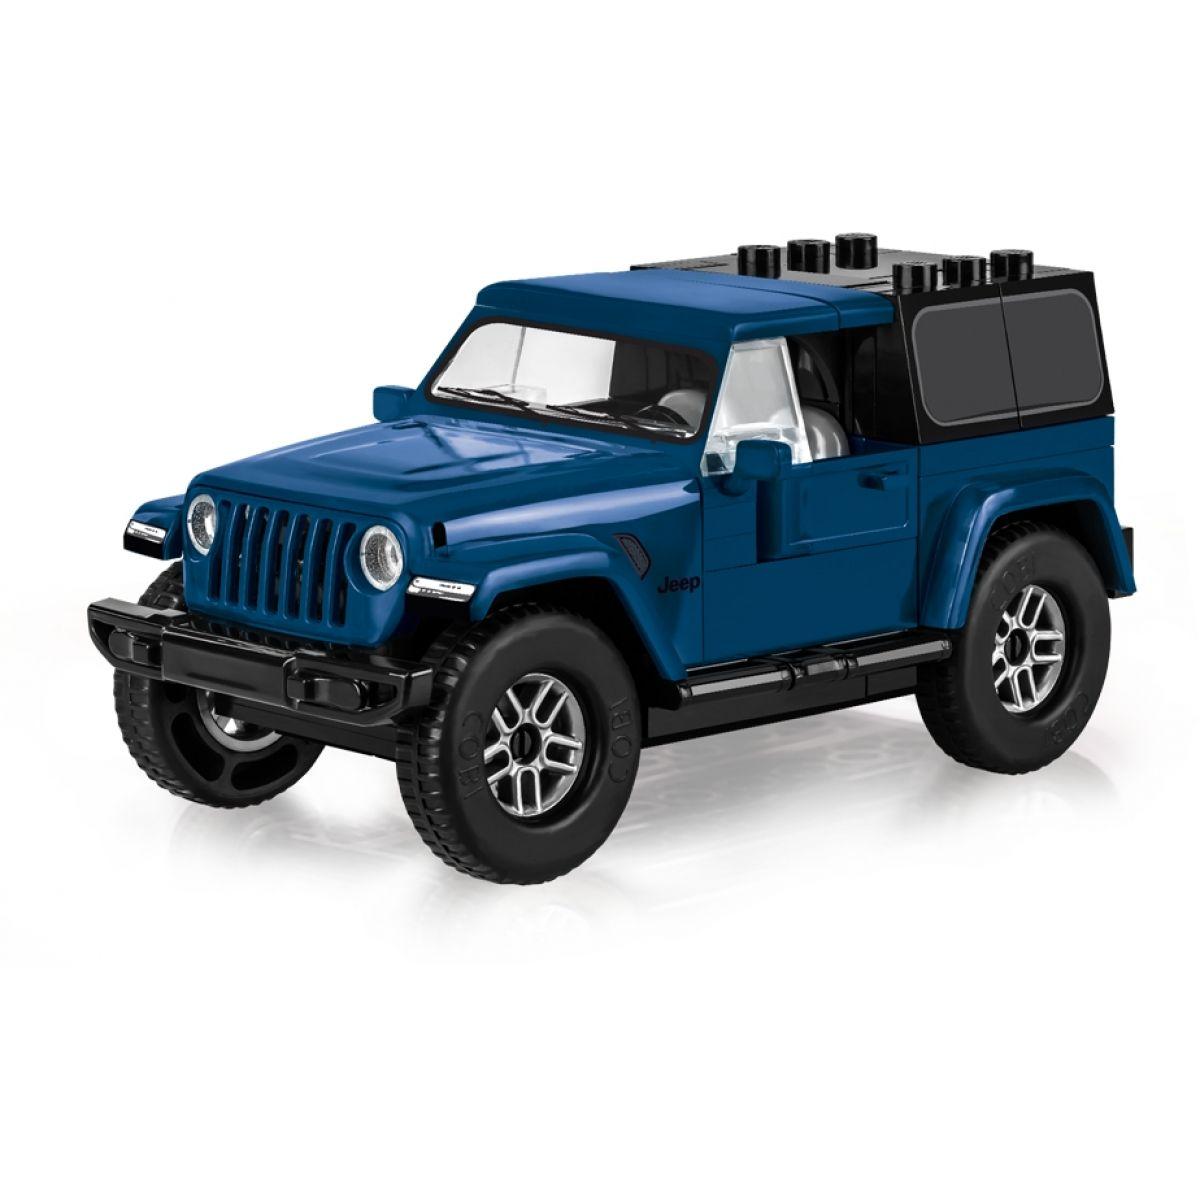 Cobi 24115 Small Army Jeep Wrangler Sport S, 1:35, modrý, 98 k